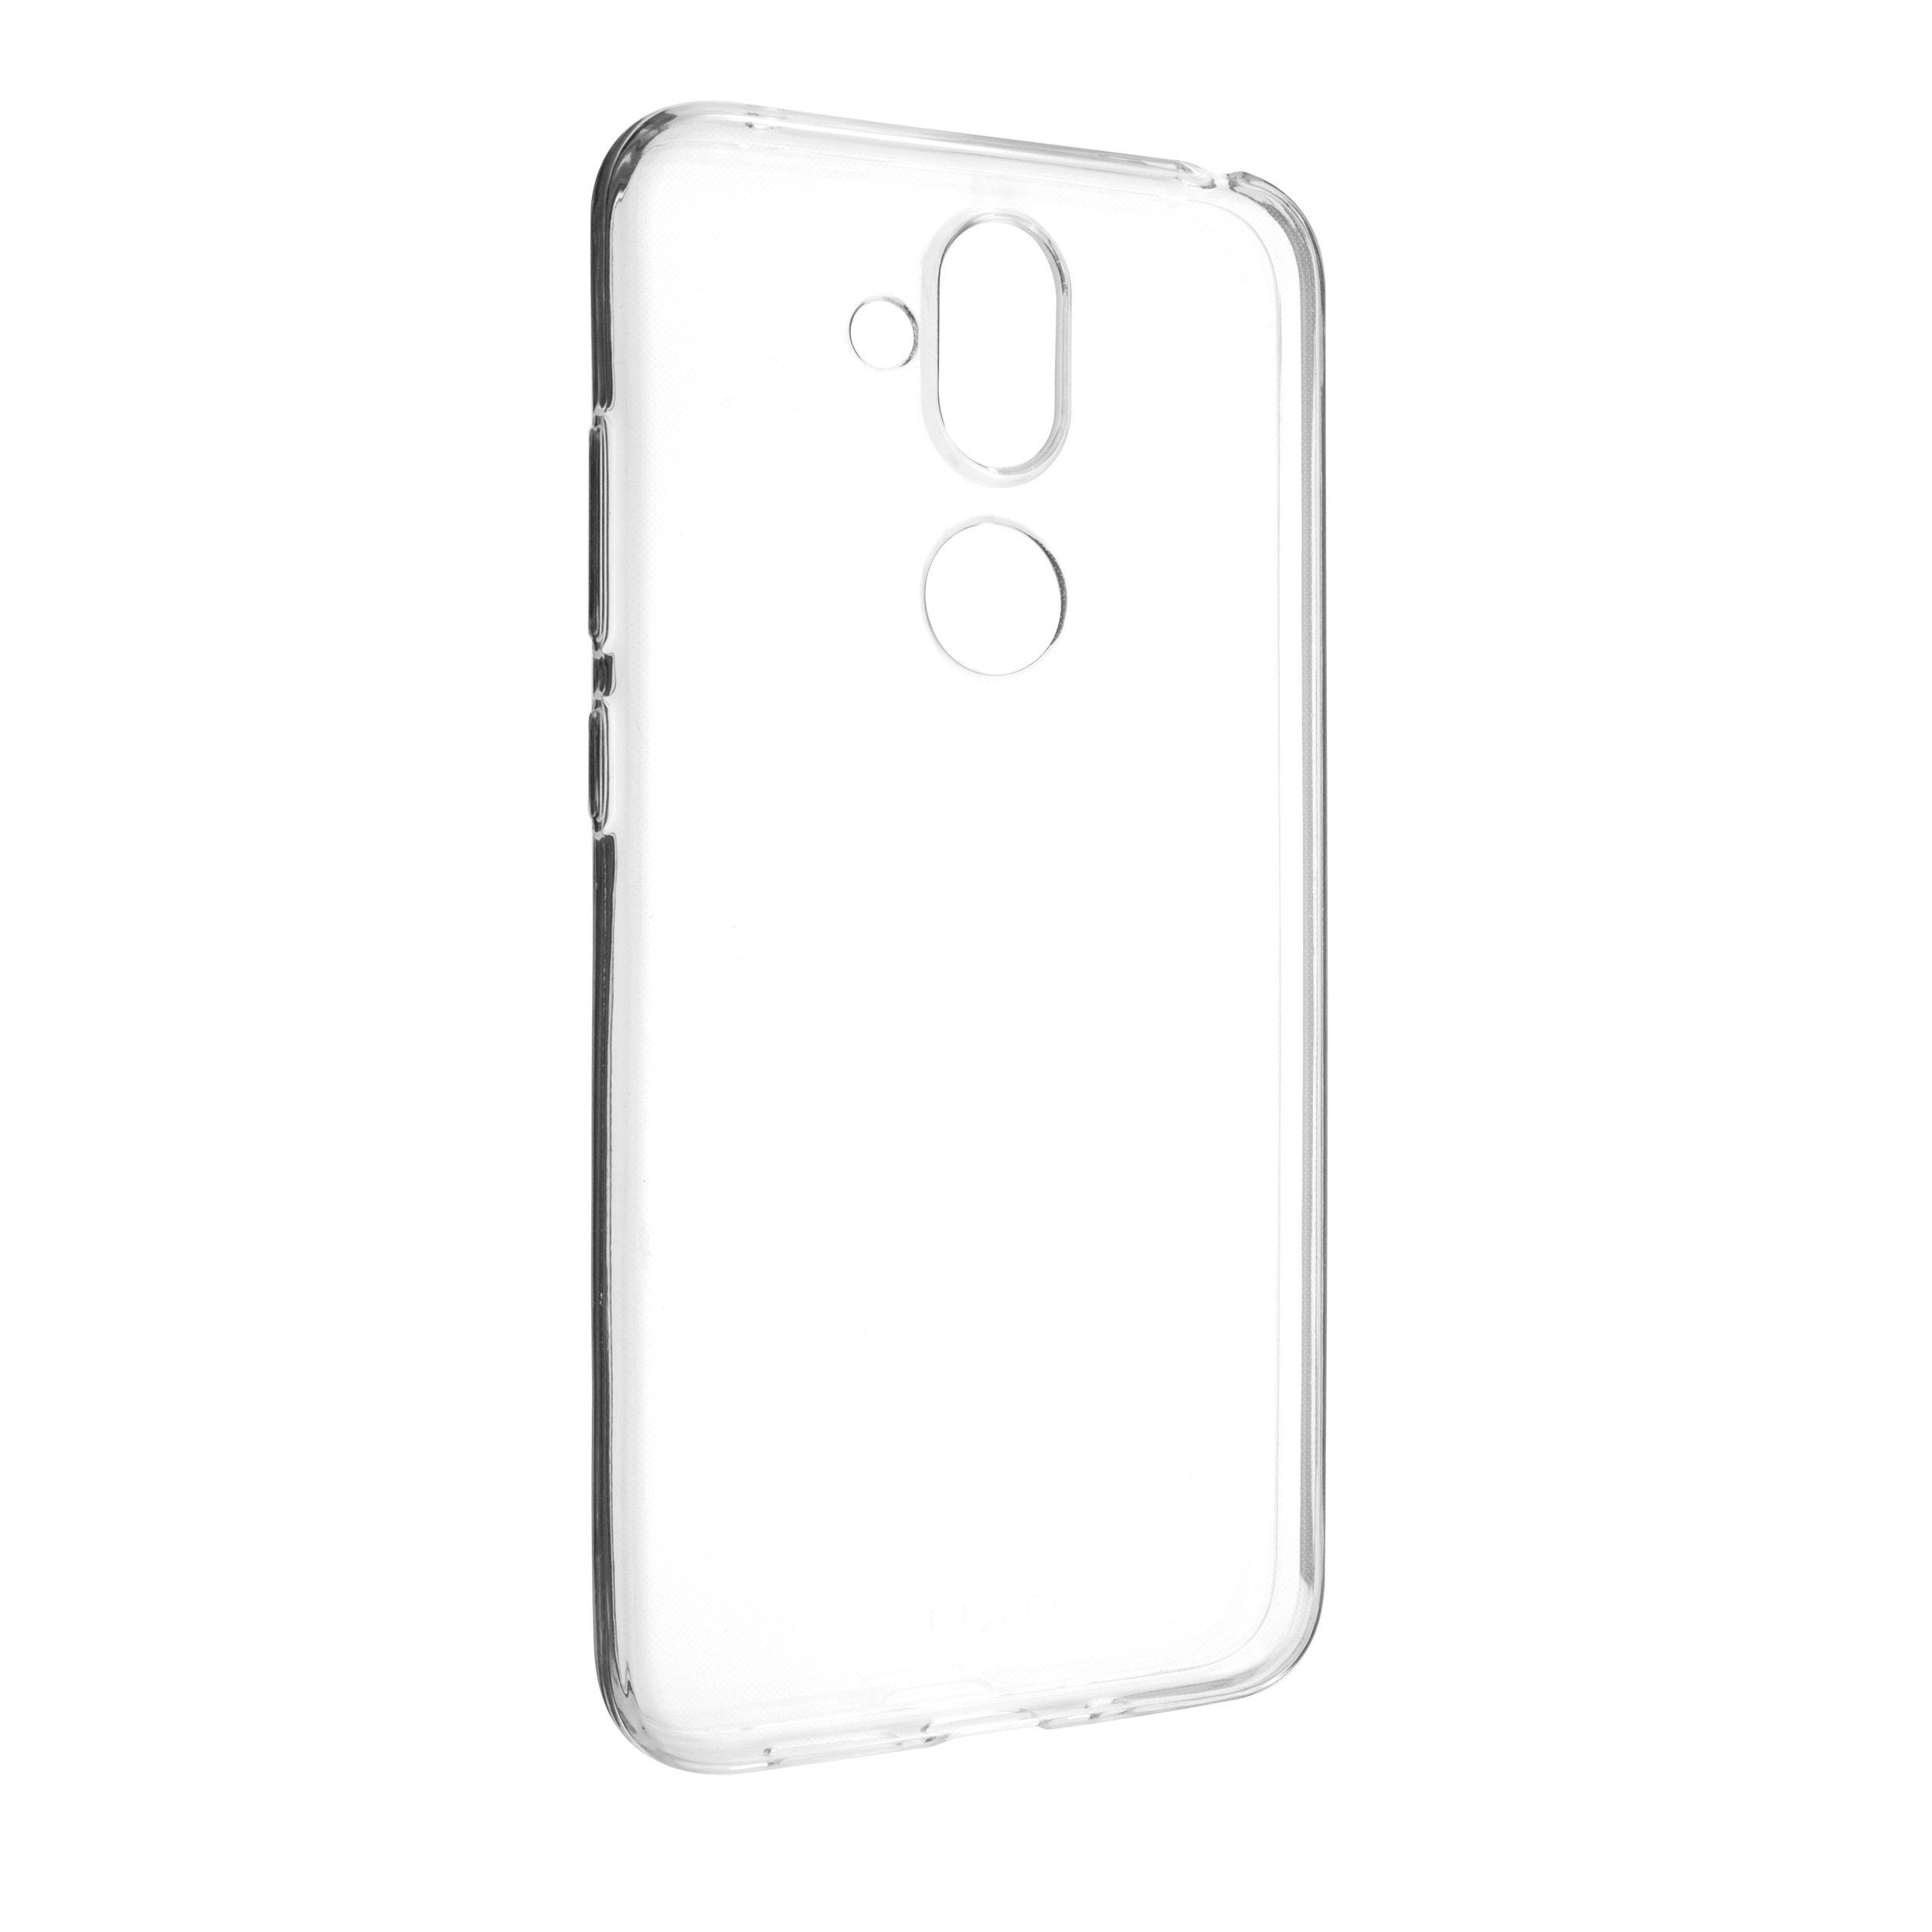 Ultratenké TPU gelové pouzdro FIXED Skin pro Nokia 7.1 Plus, 0,6 mm, čiré